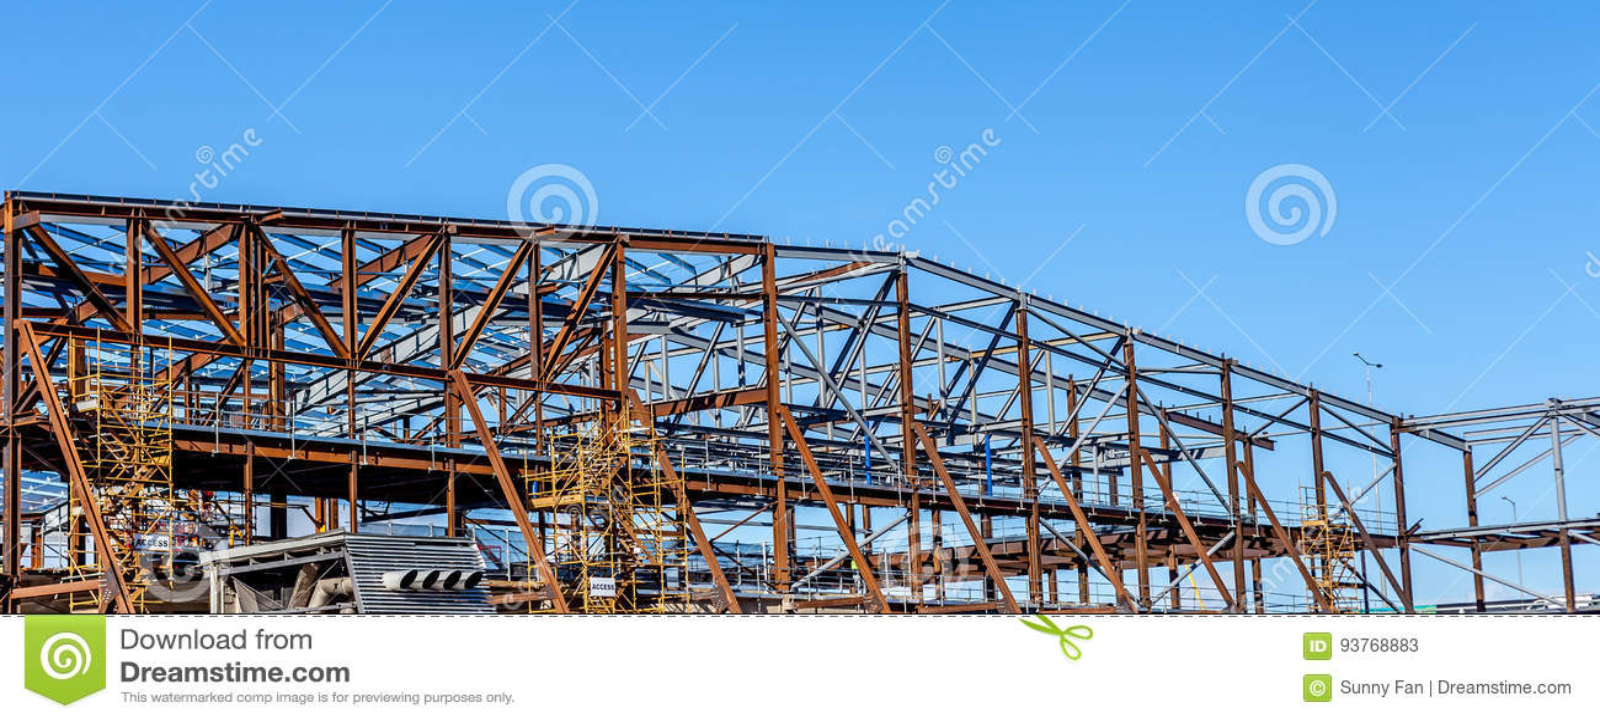 Skelett-Rahmen stockbild. Bild von konstruieren, assemble - 93768883